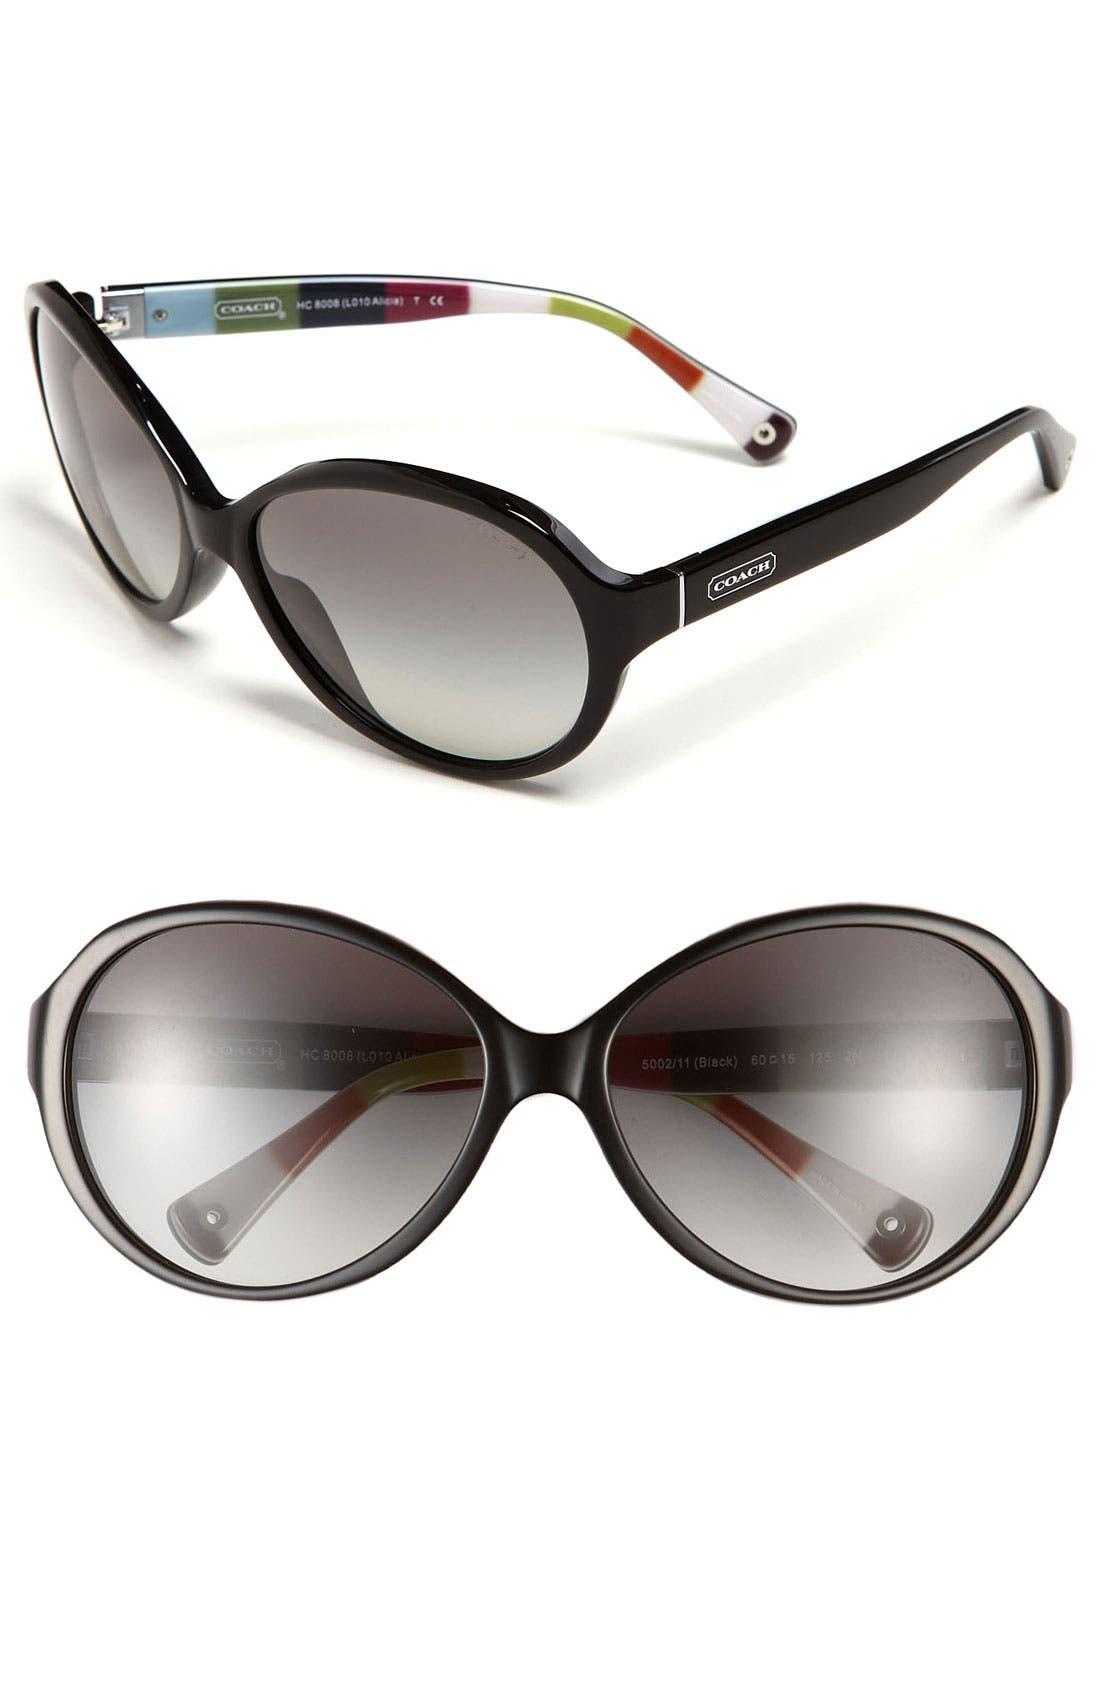 Main Image - COACH Gradient Lens Sunglasses